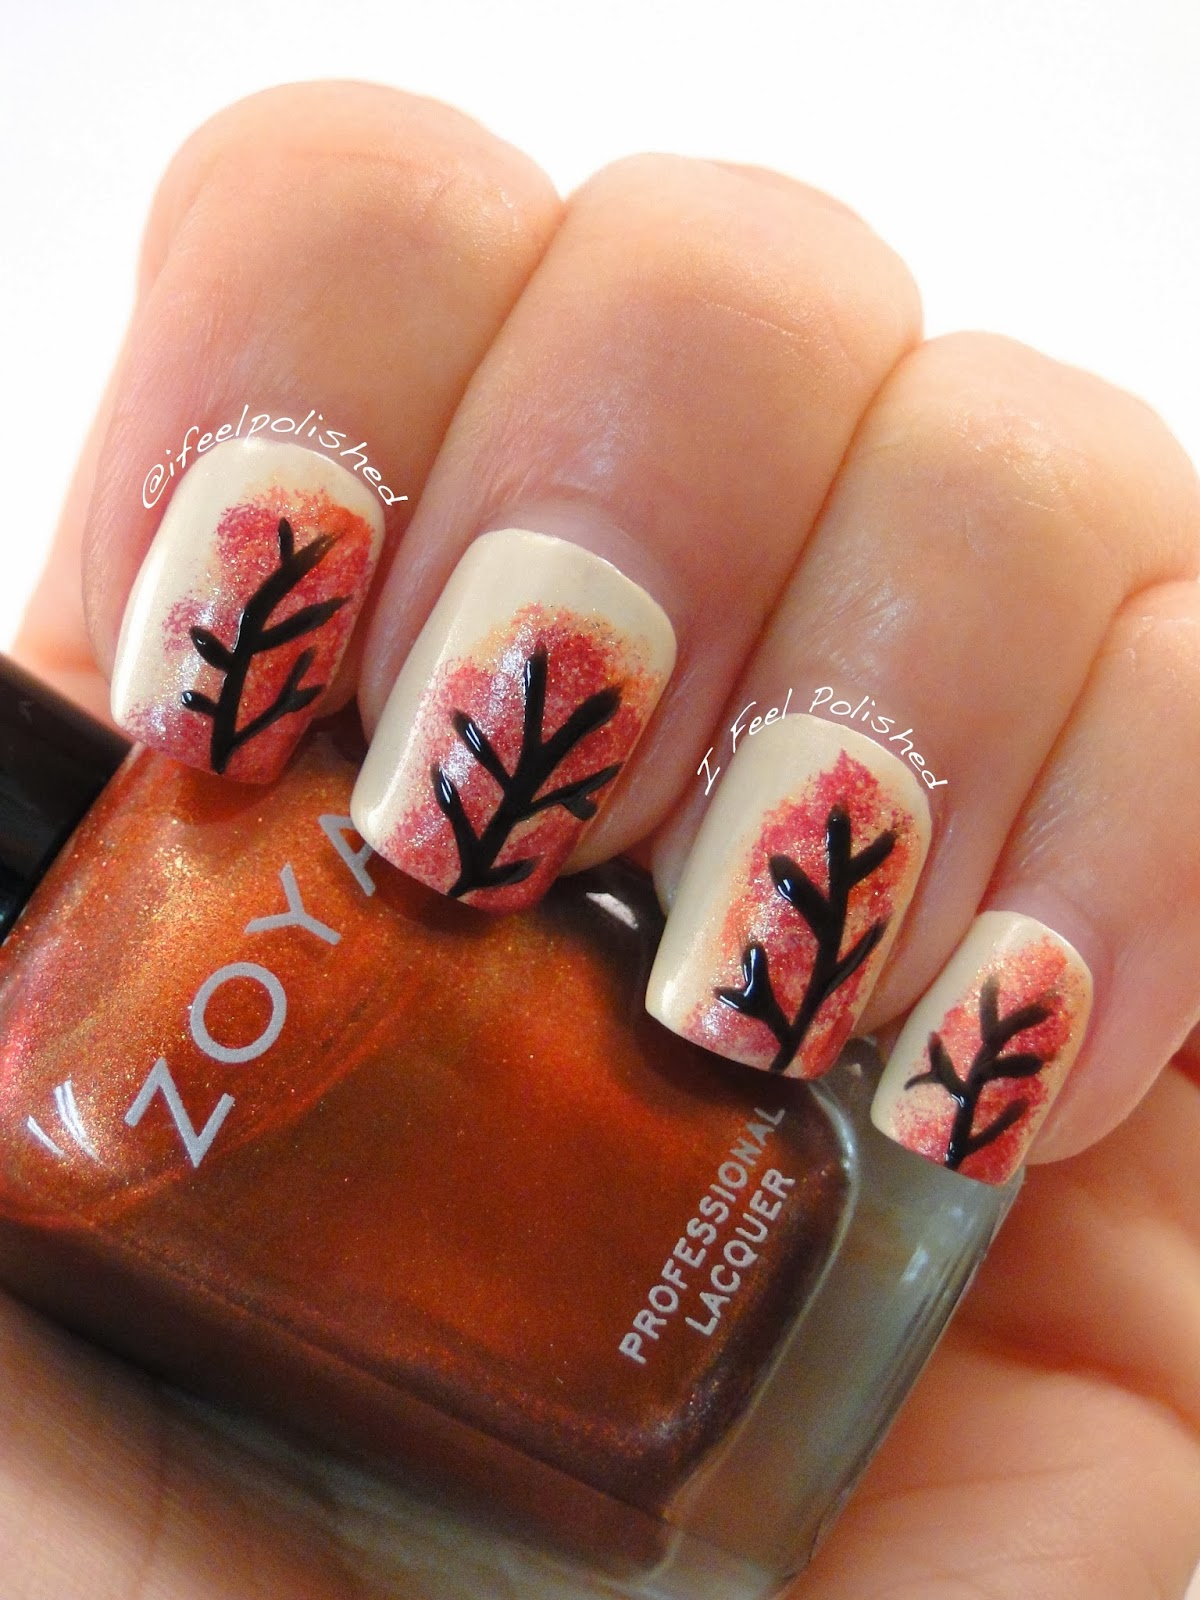 I Feel Polished!: Fall Nails